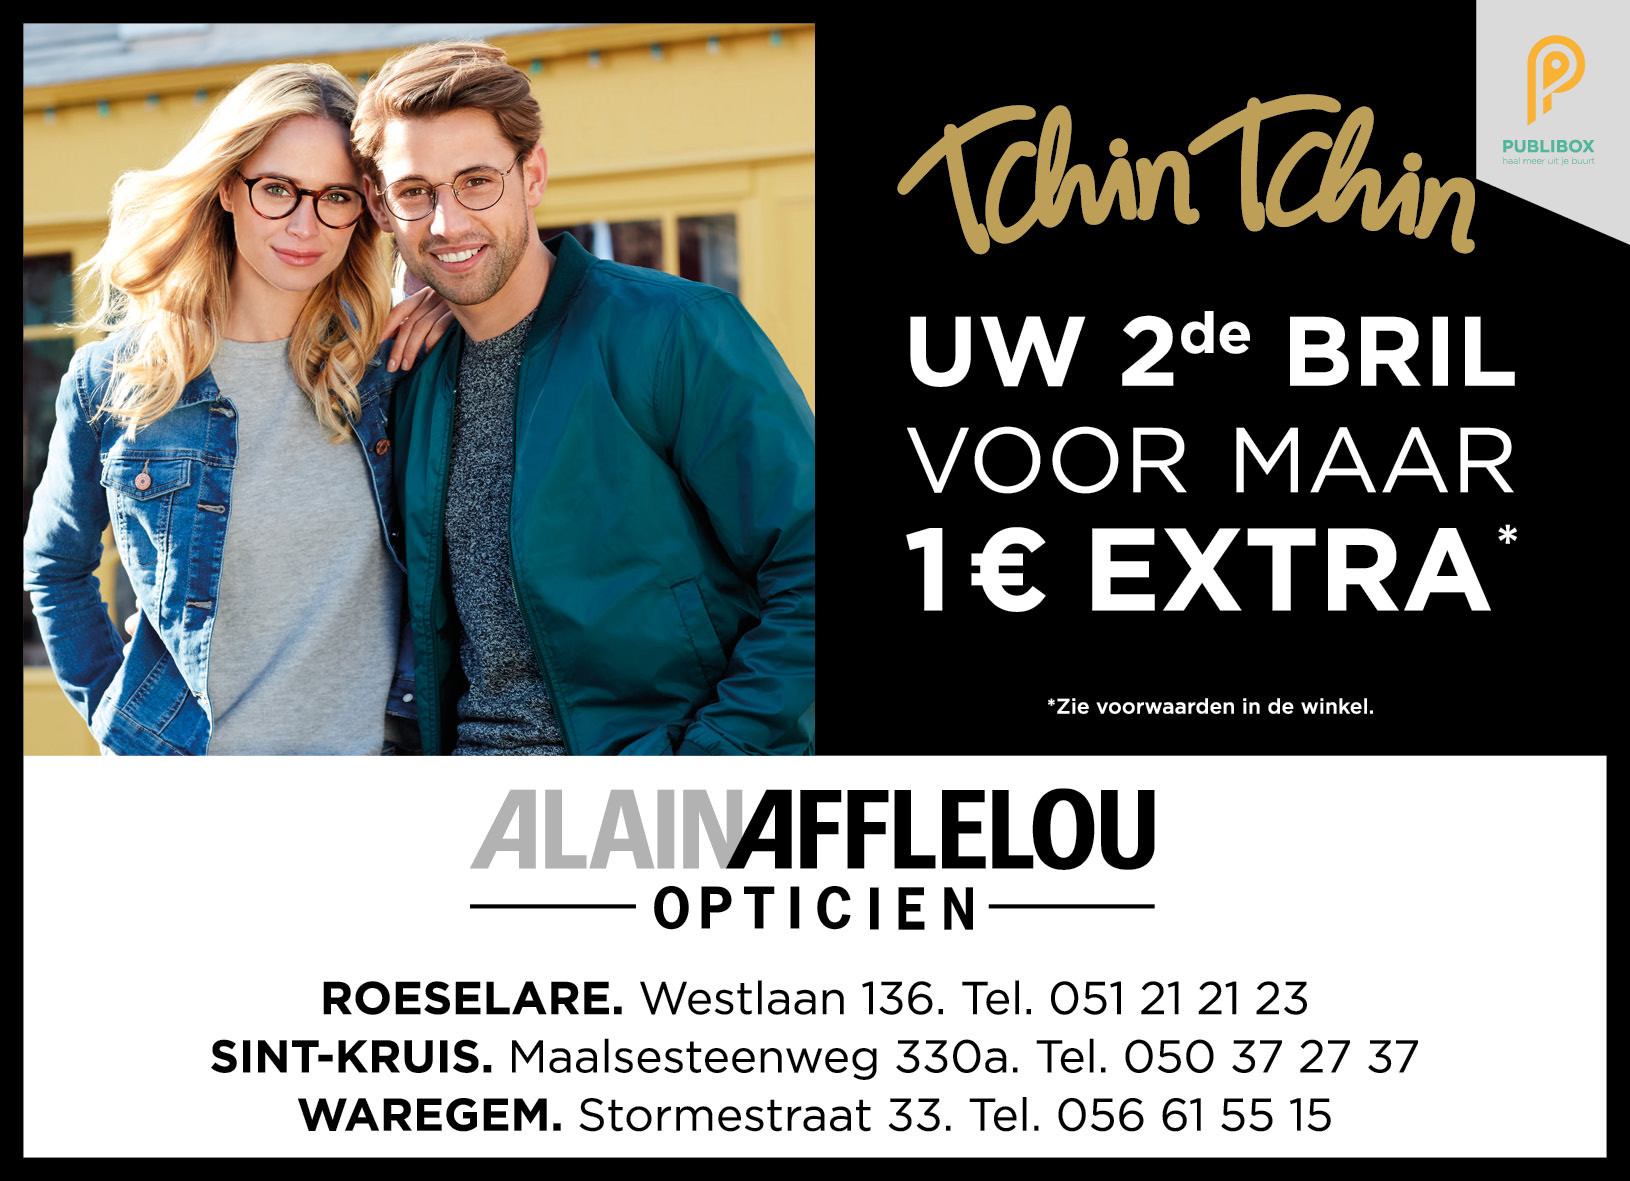 ALAIN_AFFLELOU_VJ2021